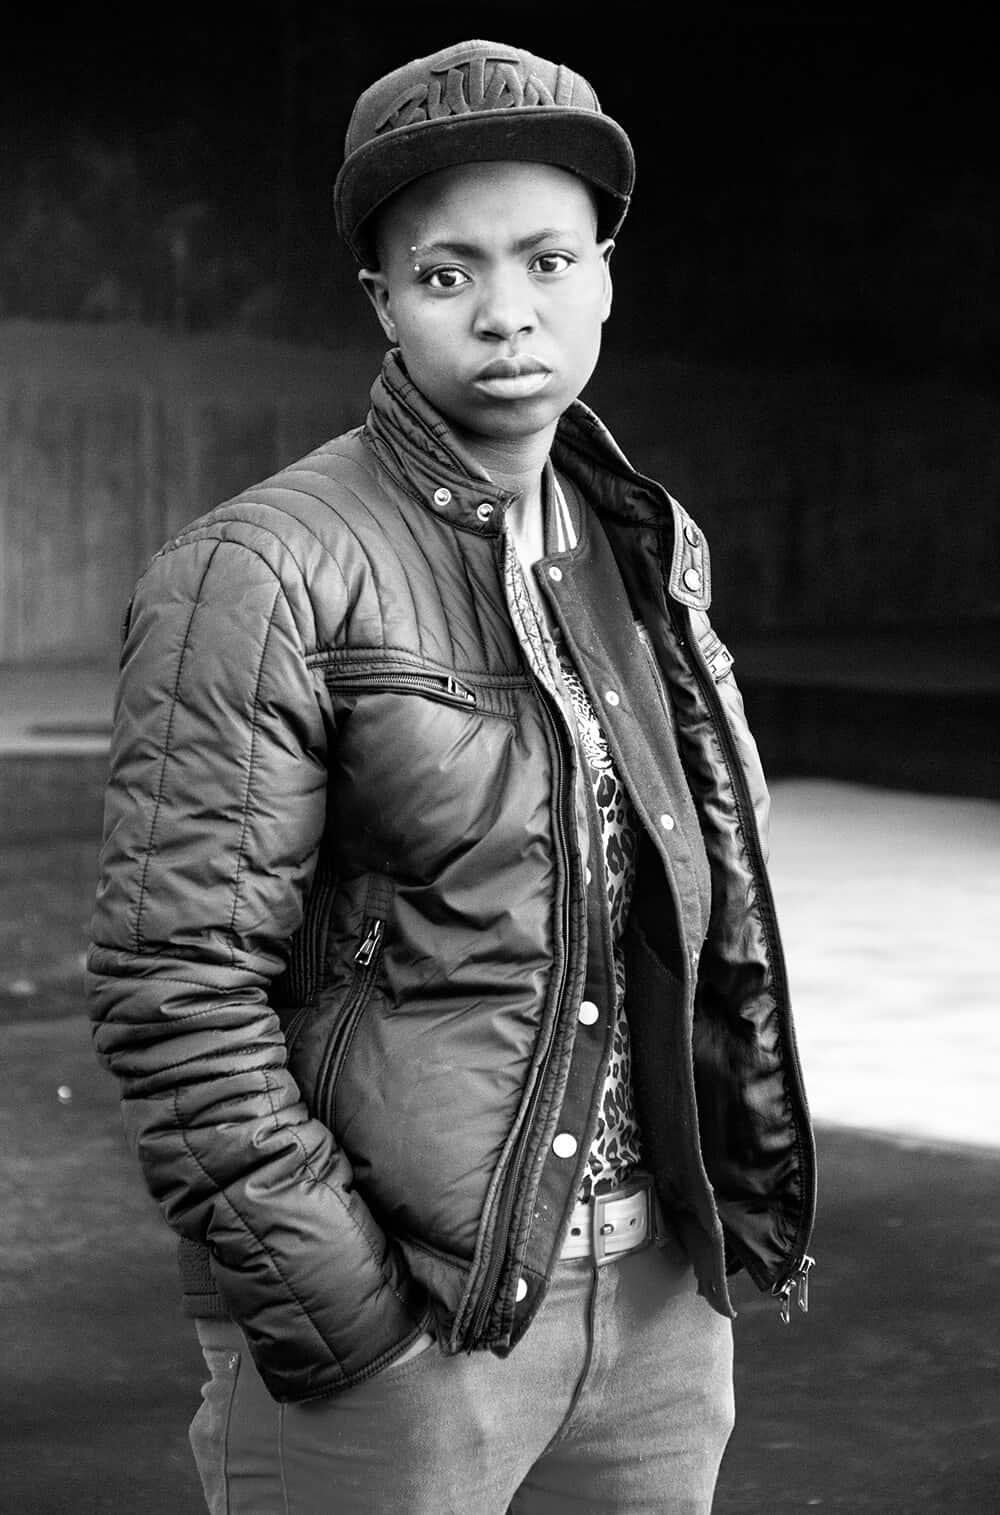 Zanele Maholi, Collen Mfazwe Womens Gaol Constitution Hill Braamfontein Johannesburg, 2013. Image courtesy of artist.